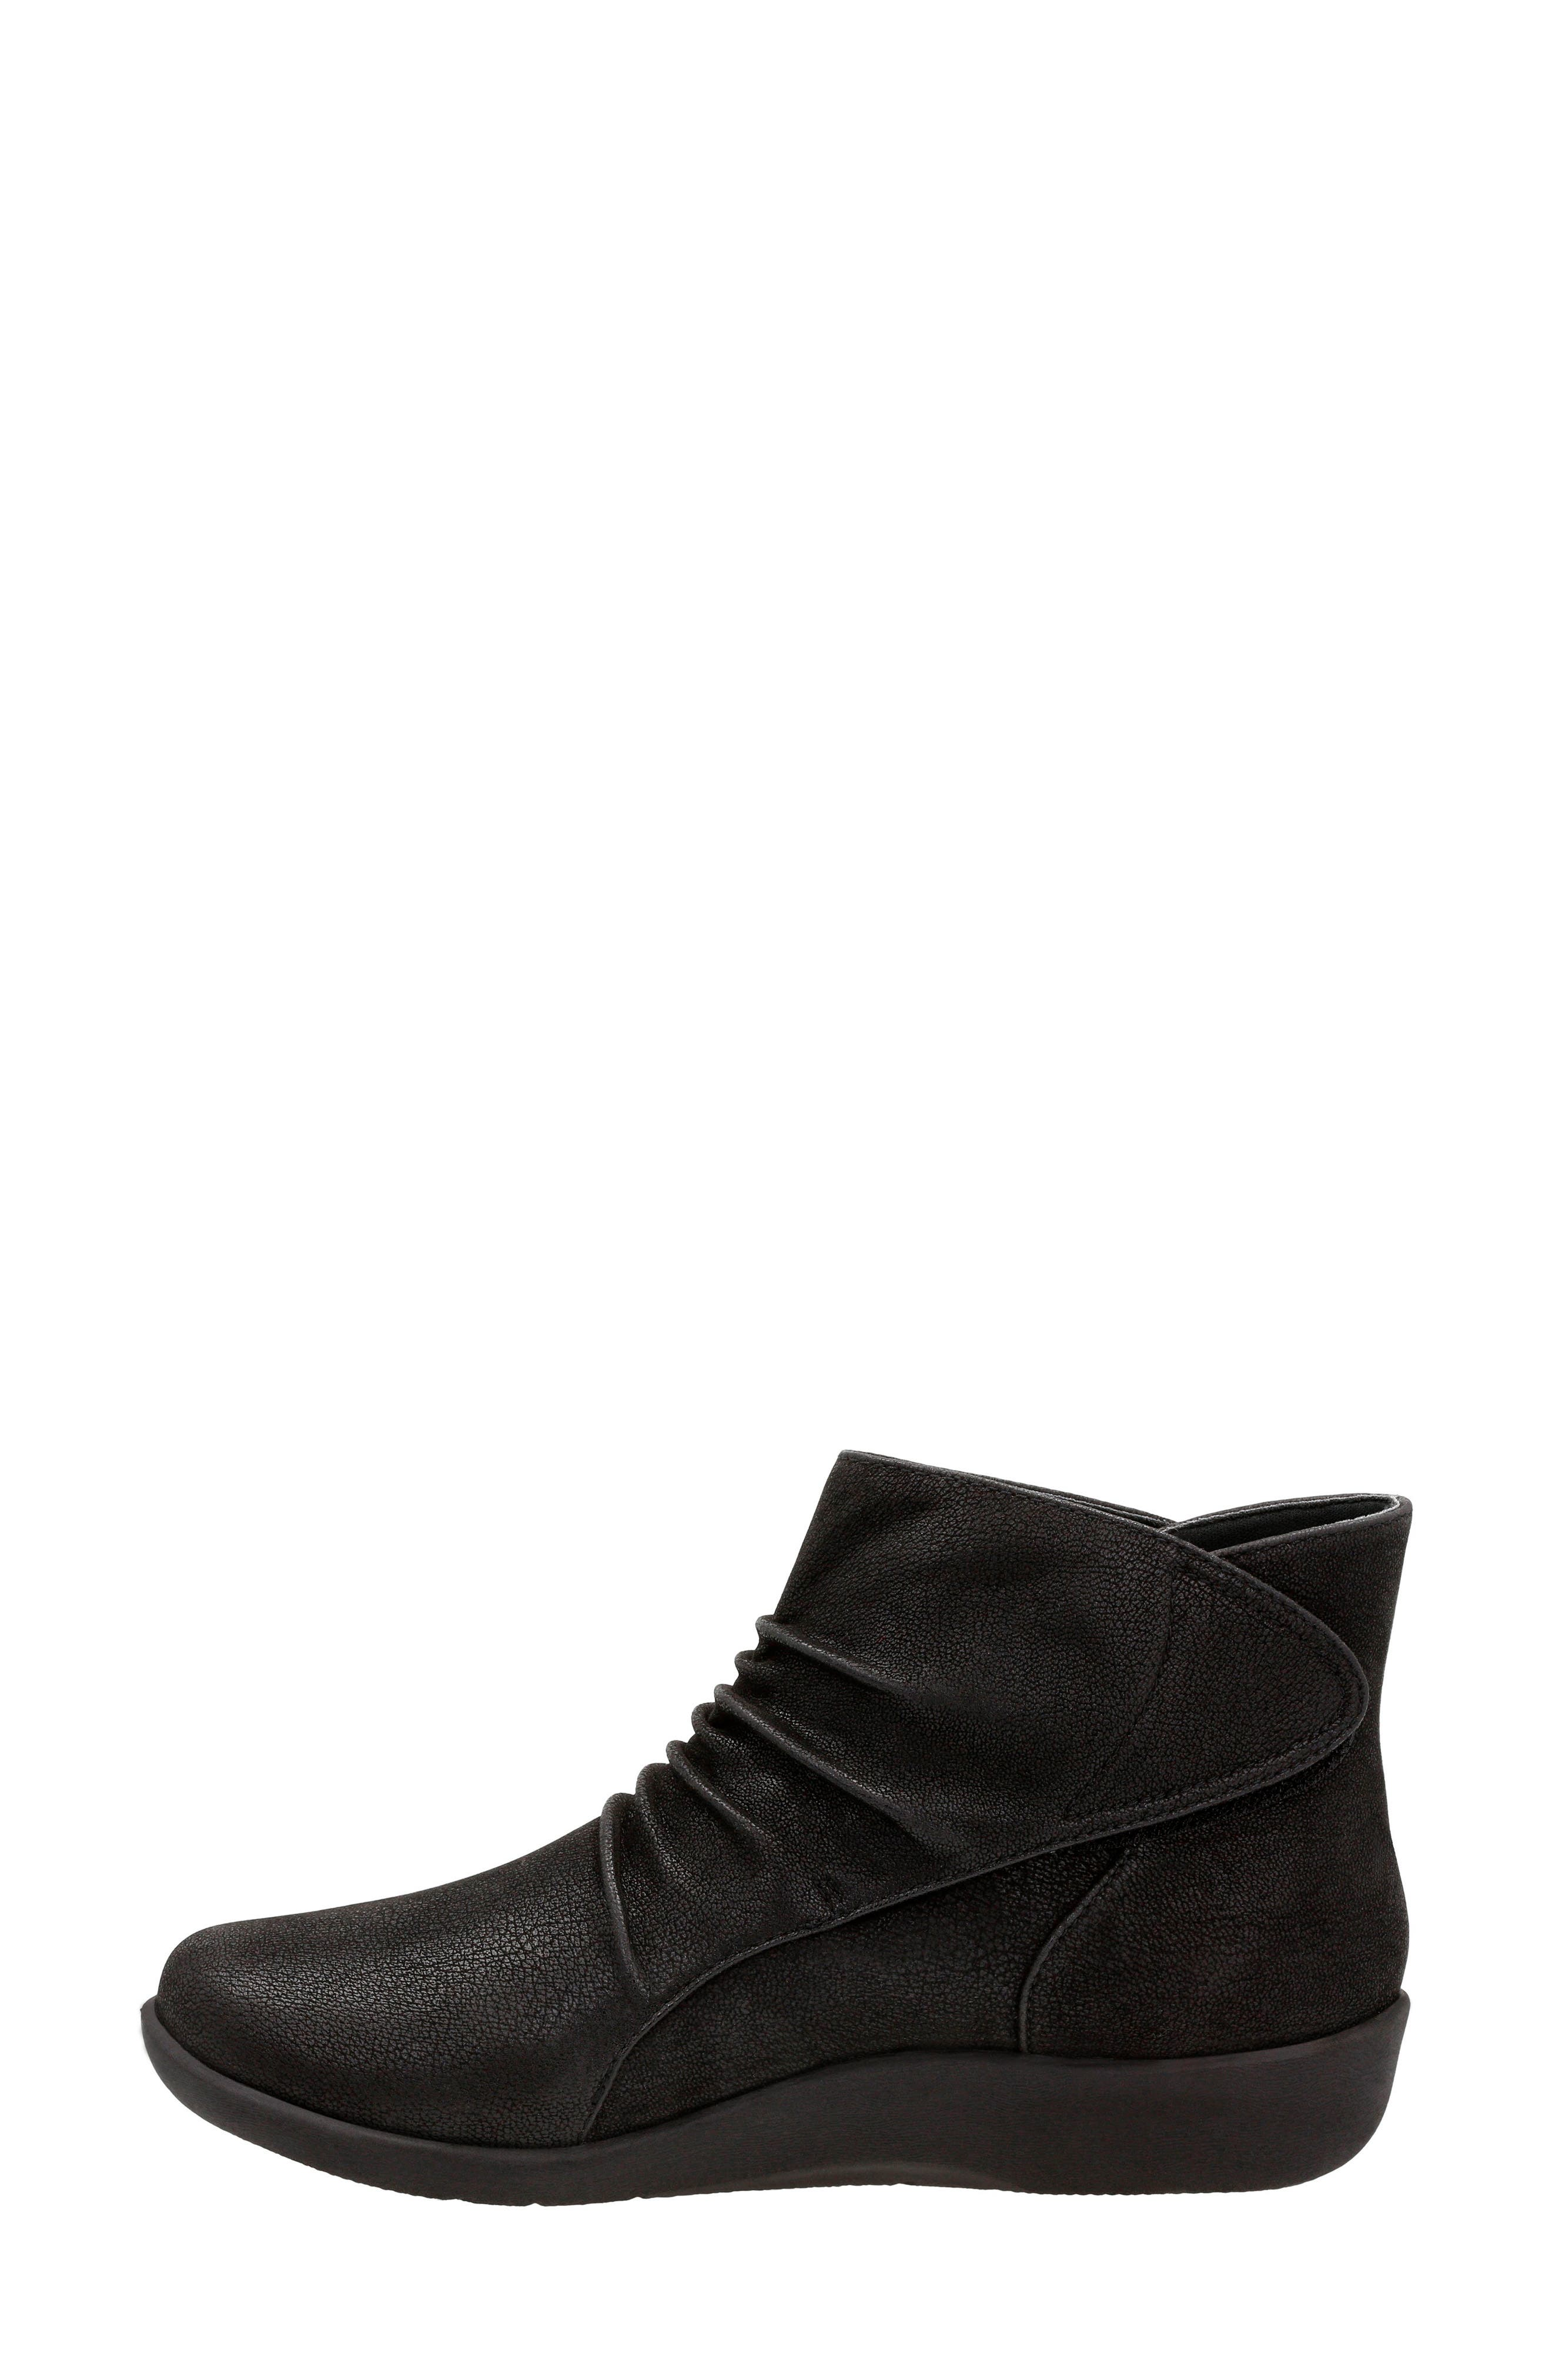 Alternate Image 2  - Clarks® Sillian Sway Boot (Women)